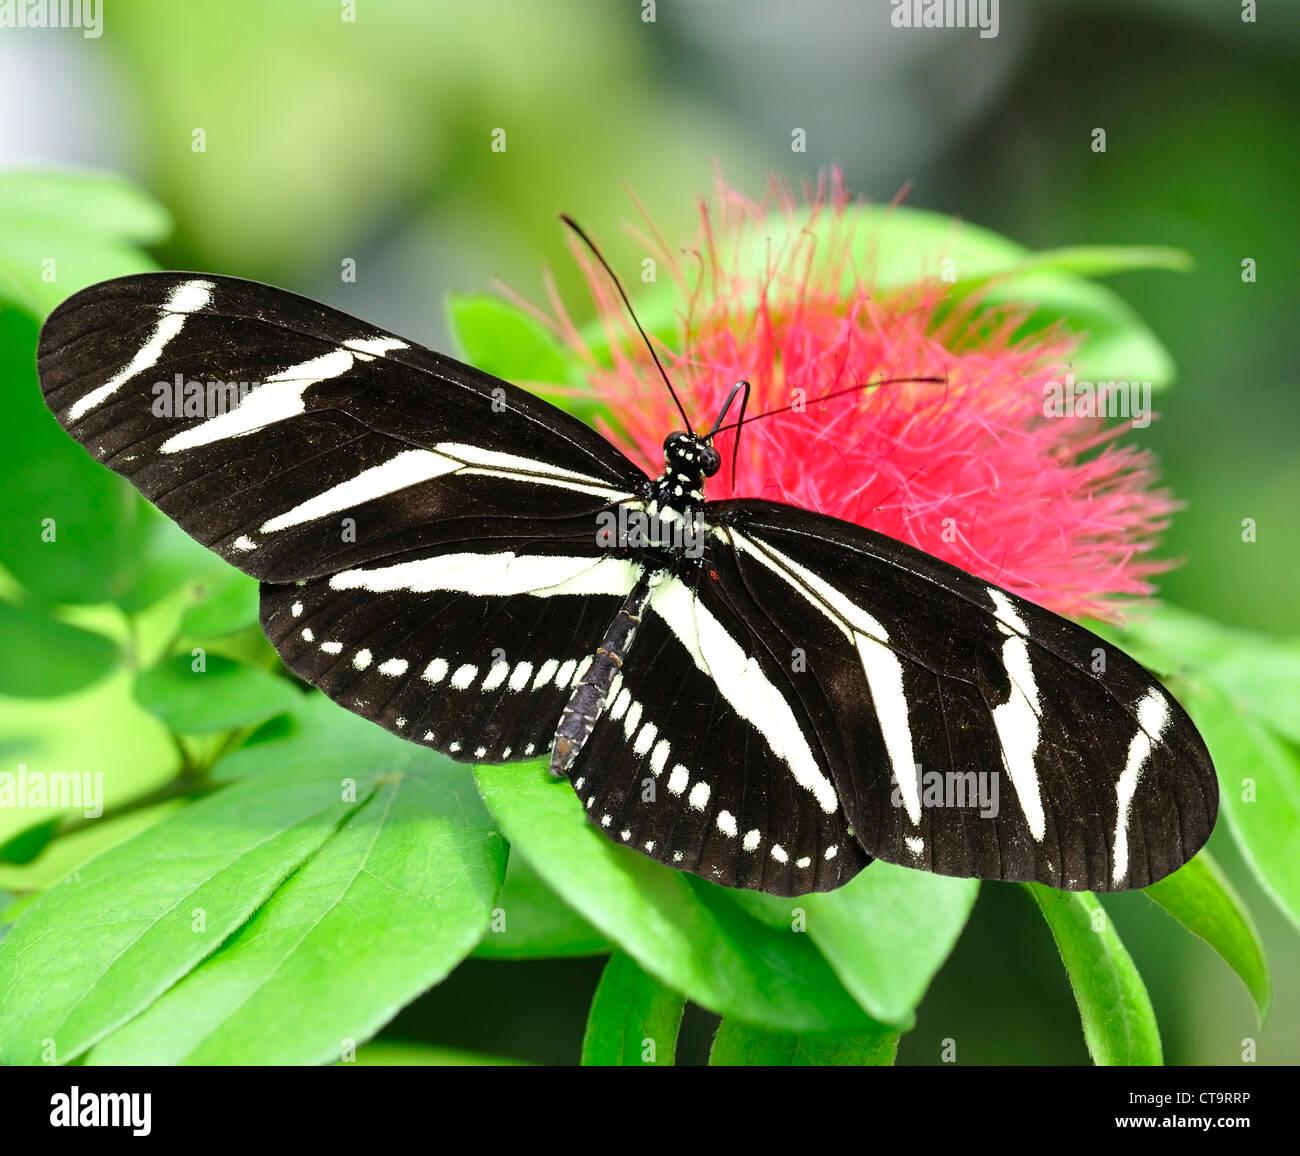 La cebra Longwing (Heliconius Charitonius) Butterfly Imagen De Stock